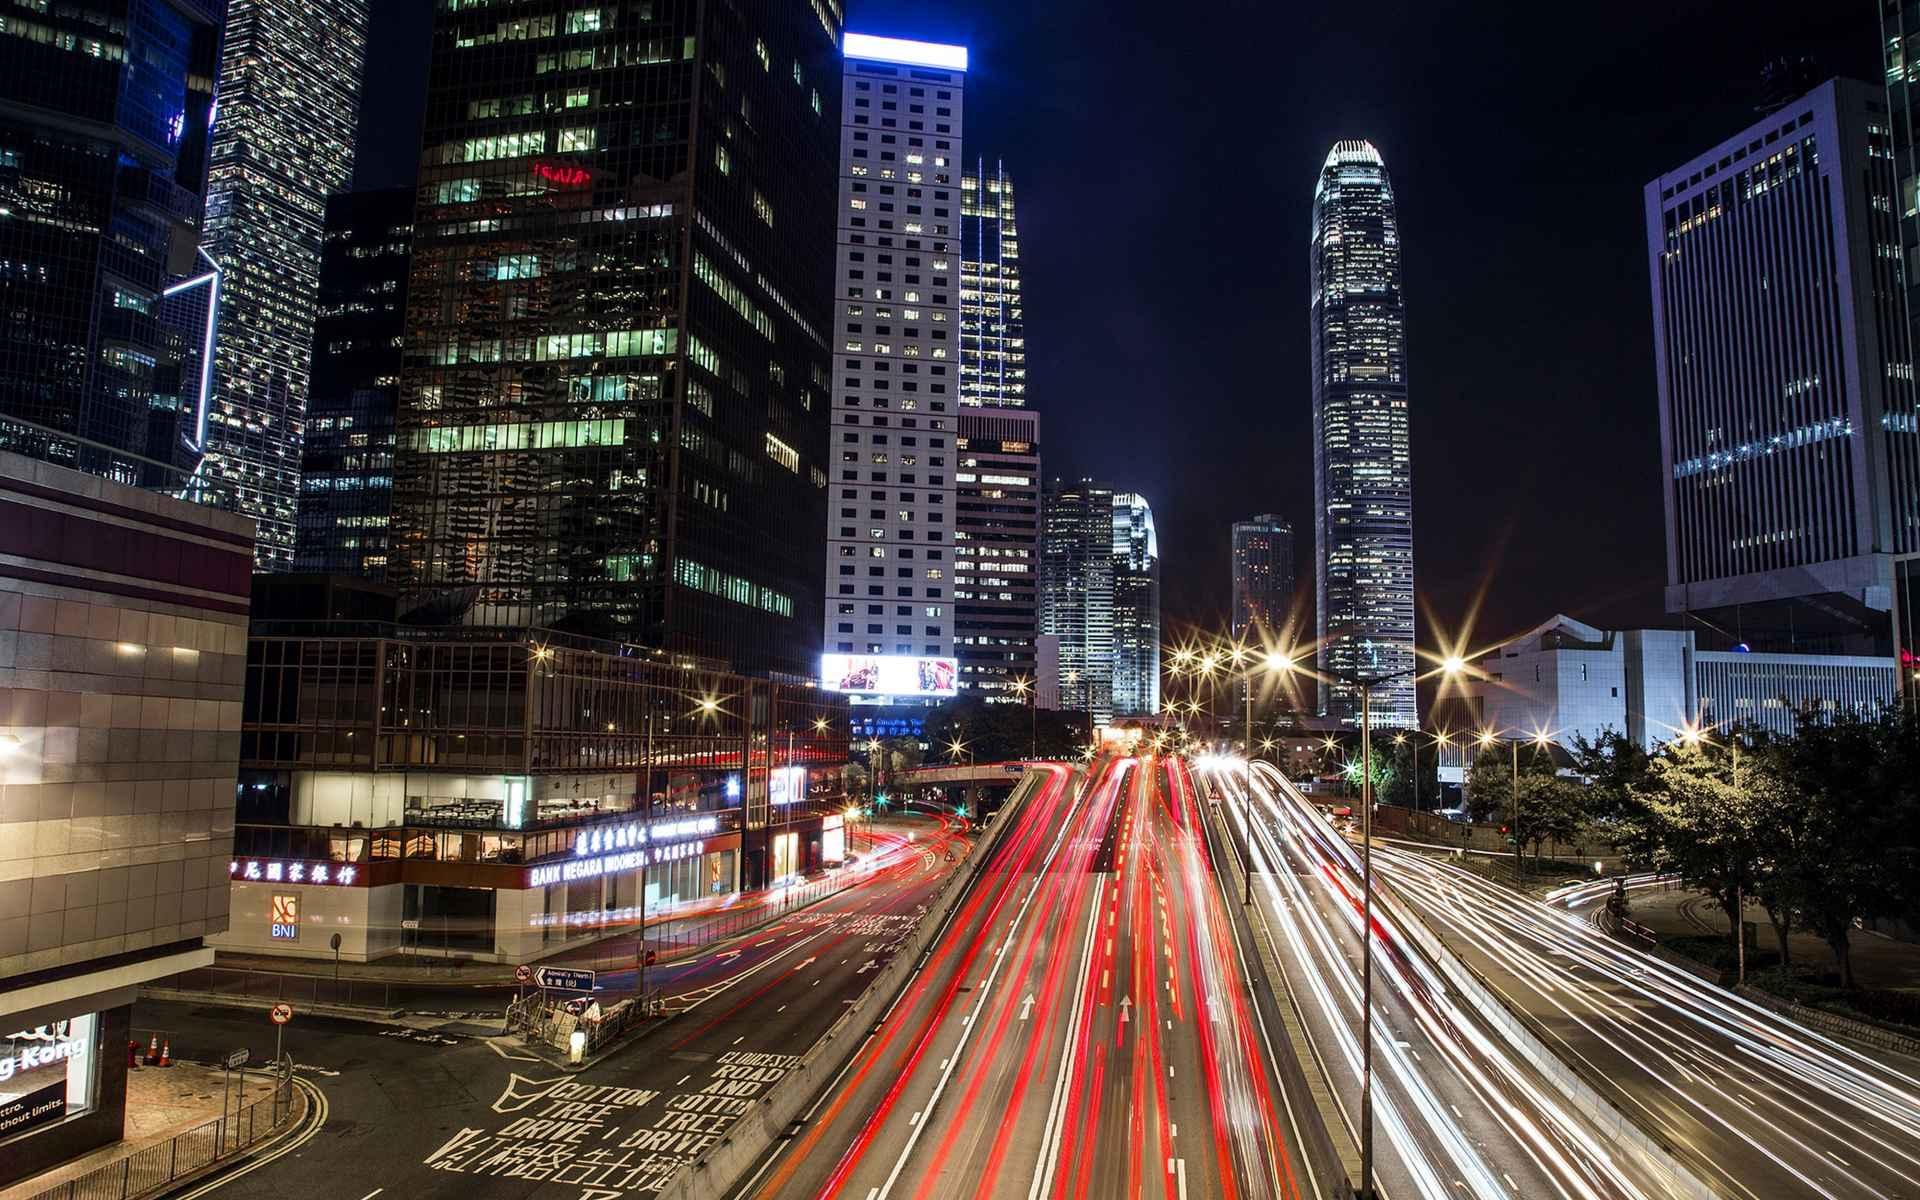 Pełne Klatki: Hong Kong Biuro podróży Goforworld by Kuźniar